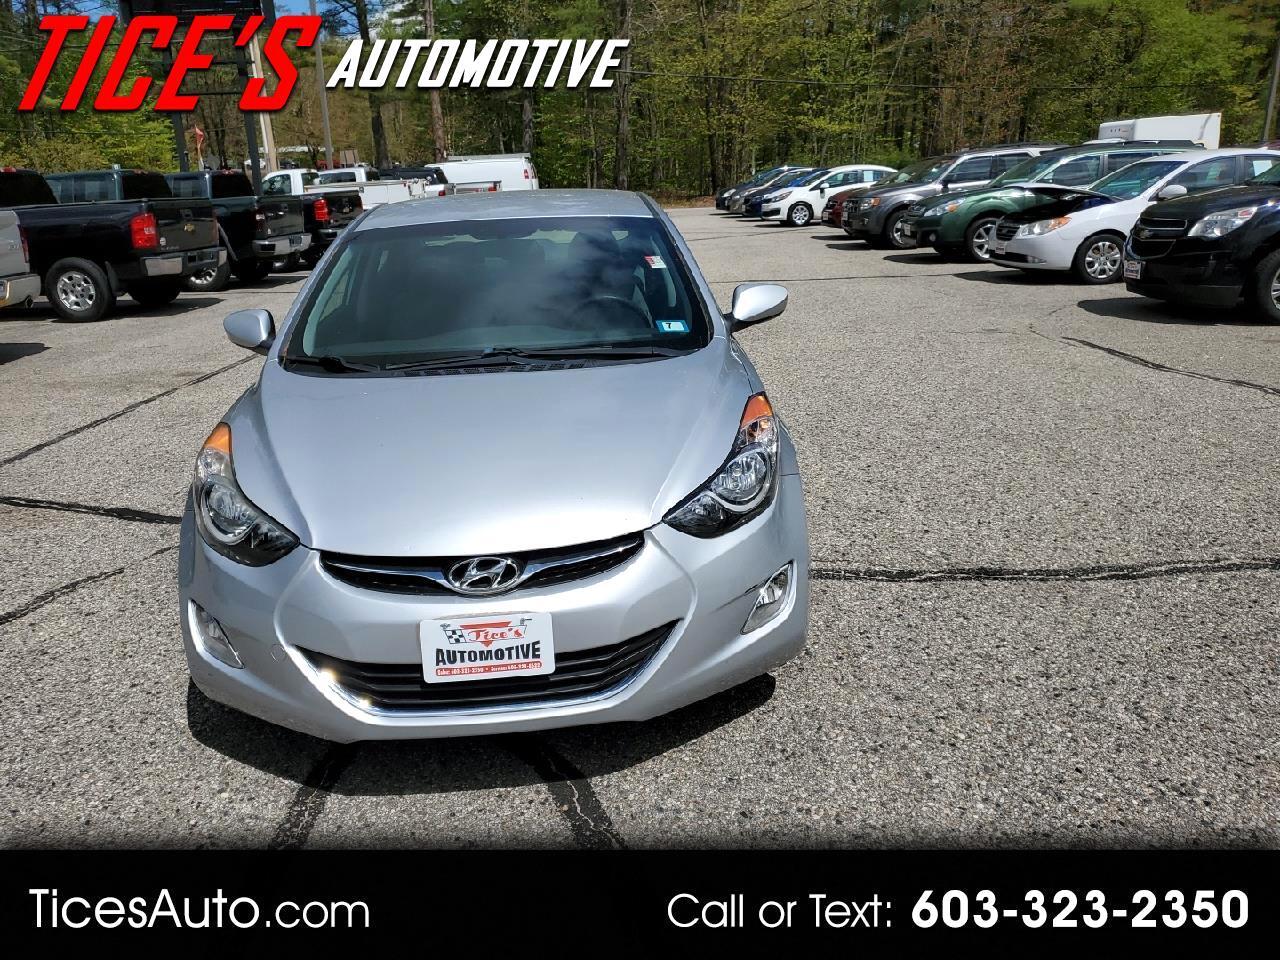 Hyundai Elantra 4dr Sdn Auto GLS PZEV (Alabama Plant) *Ltd Avail* 2013